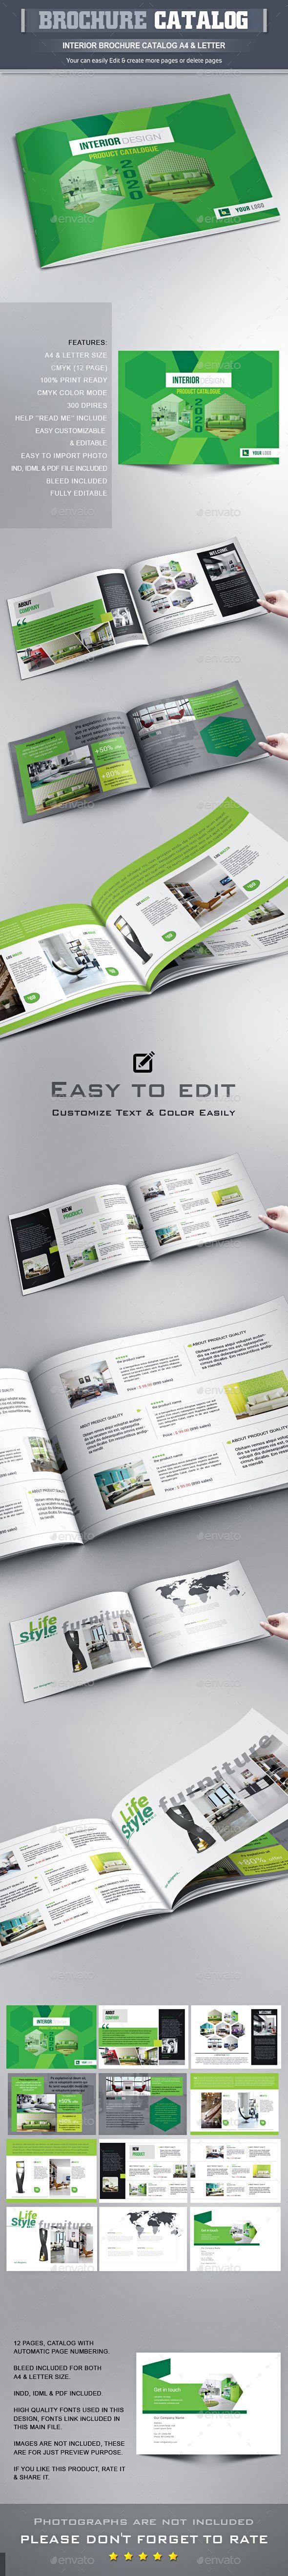 Interior Brochure Catalog Template InDesign INDD #design Download: http://graphicriver.net/item/interior-brochure-catalog-template/13971867?ref=ksioks